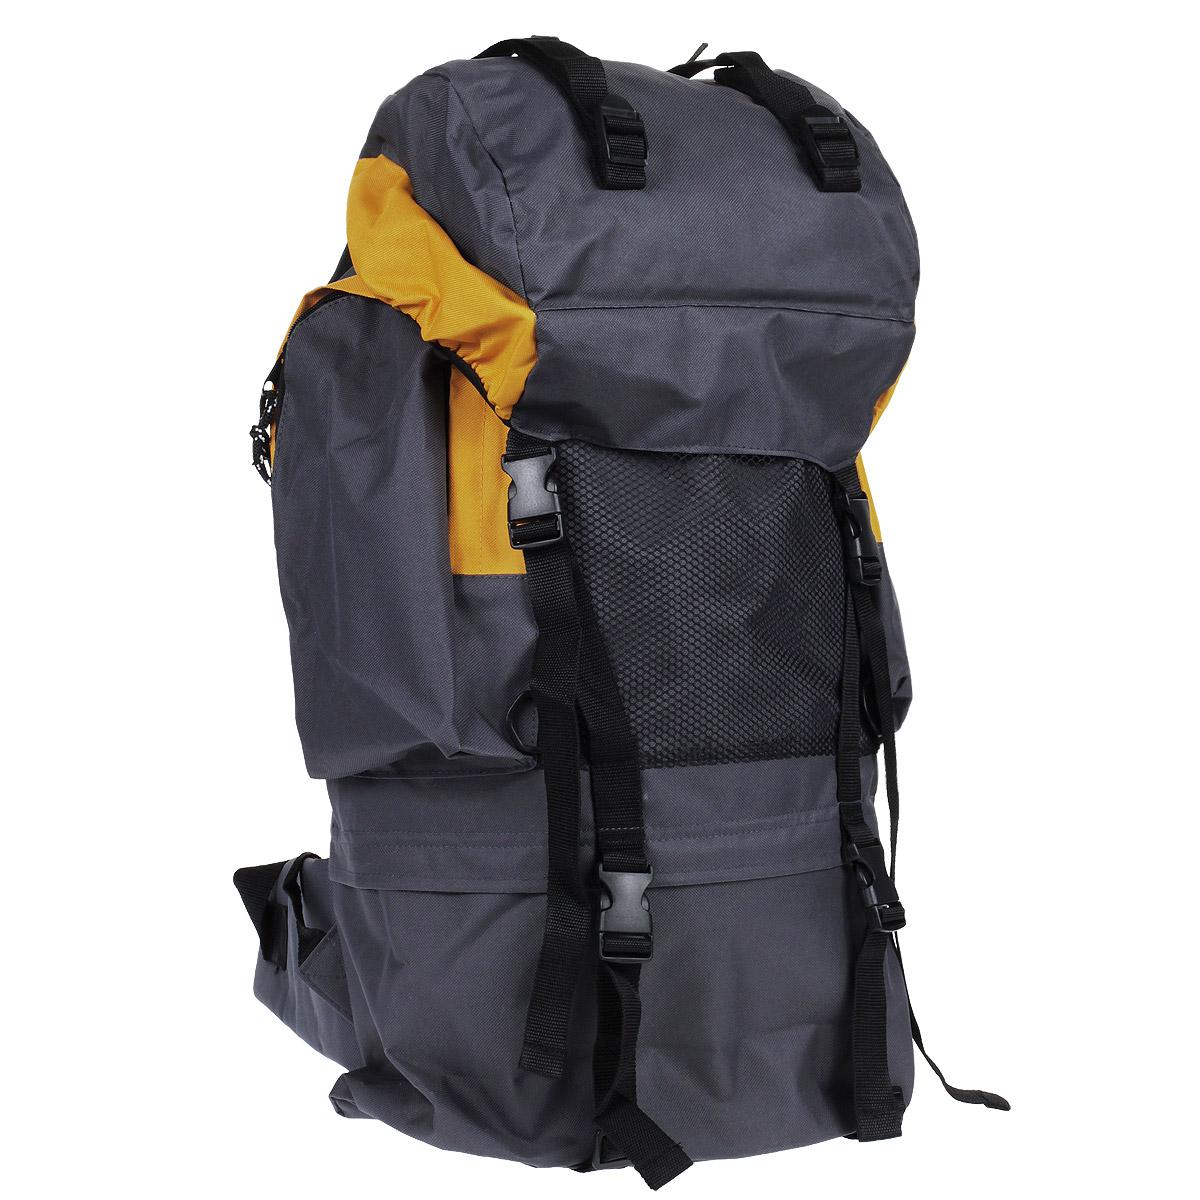 Рюкзак туристический Happy Camper, цвет: серый, желтый. R-735